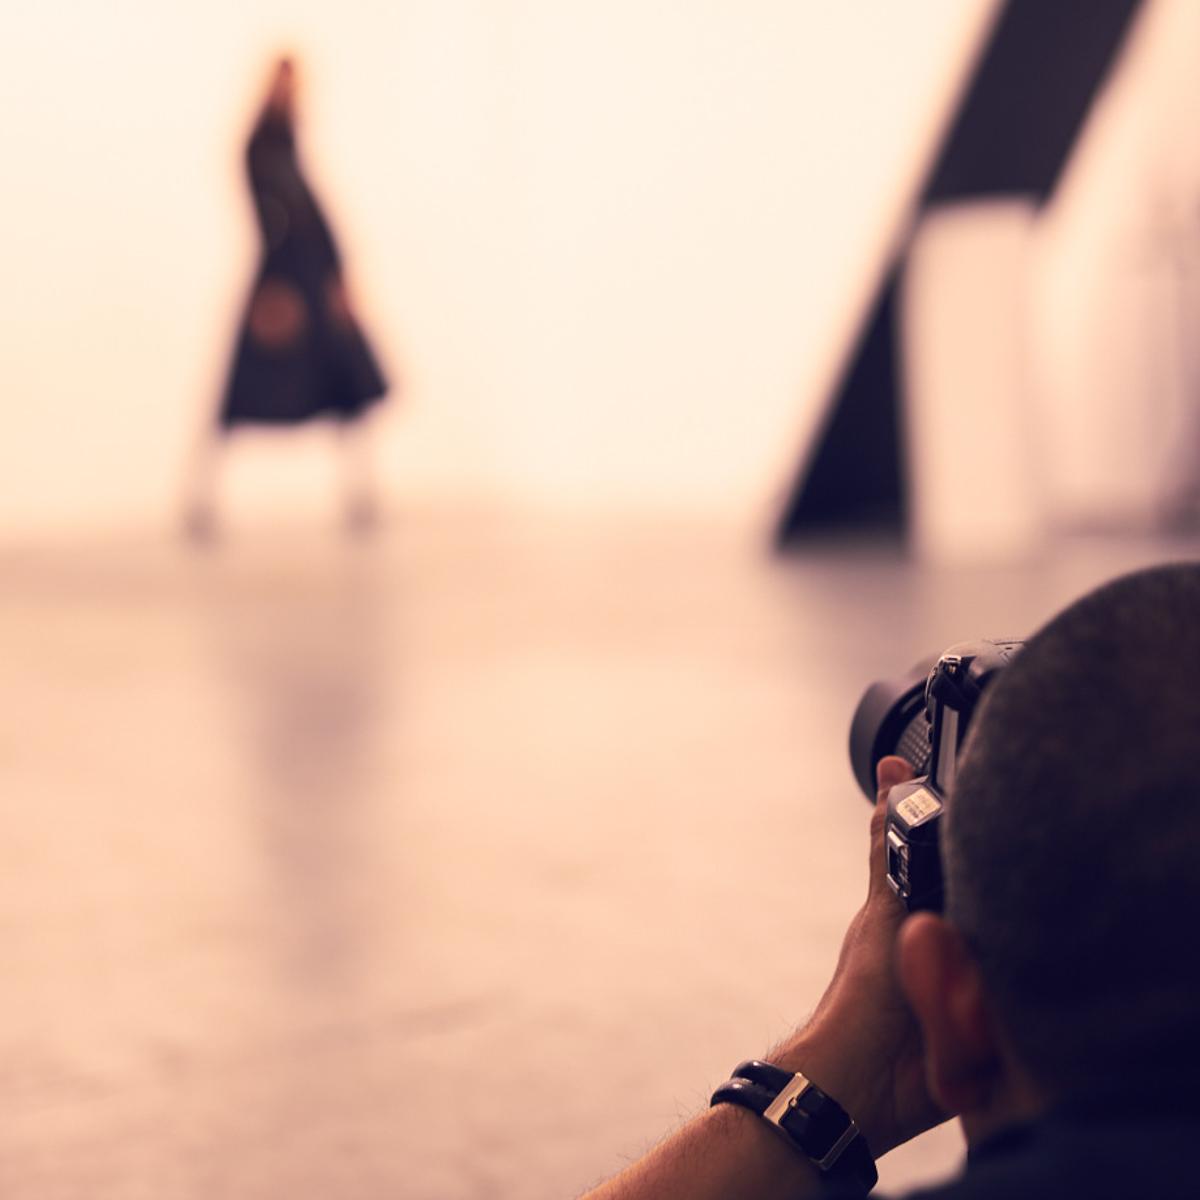 London-photographer-JC-Candanedo-Grey-Pistachio-Fashion-Corporate-Portraits-Headshots-Blog-Creative-Industry-London-black-friday-sales-deals-offers-shopping.jpg